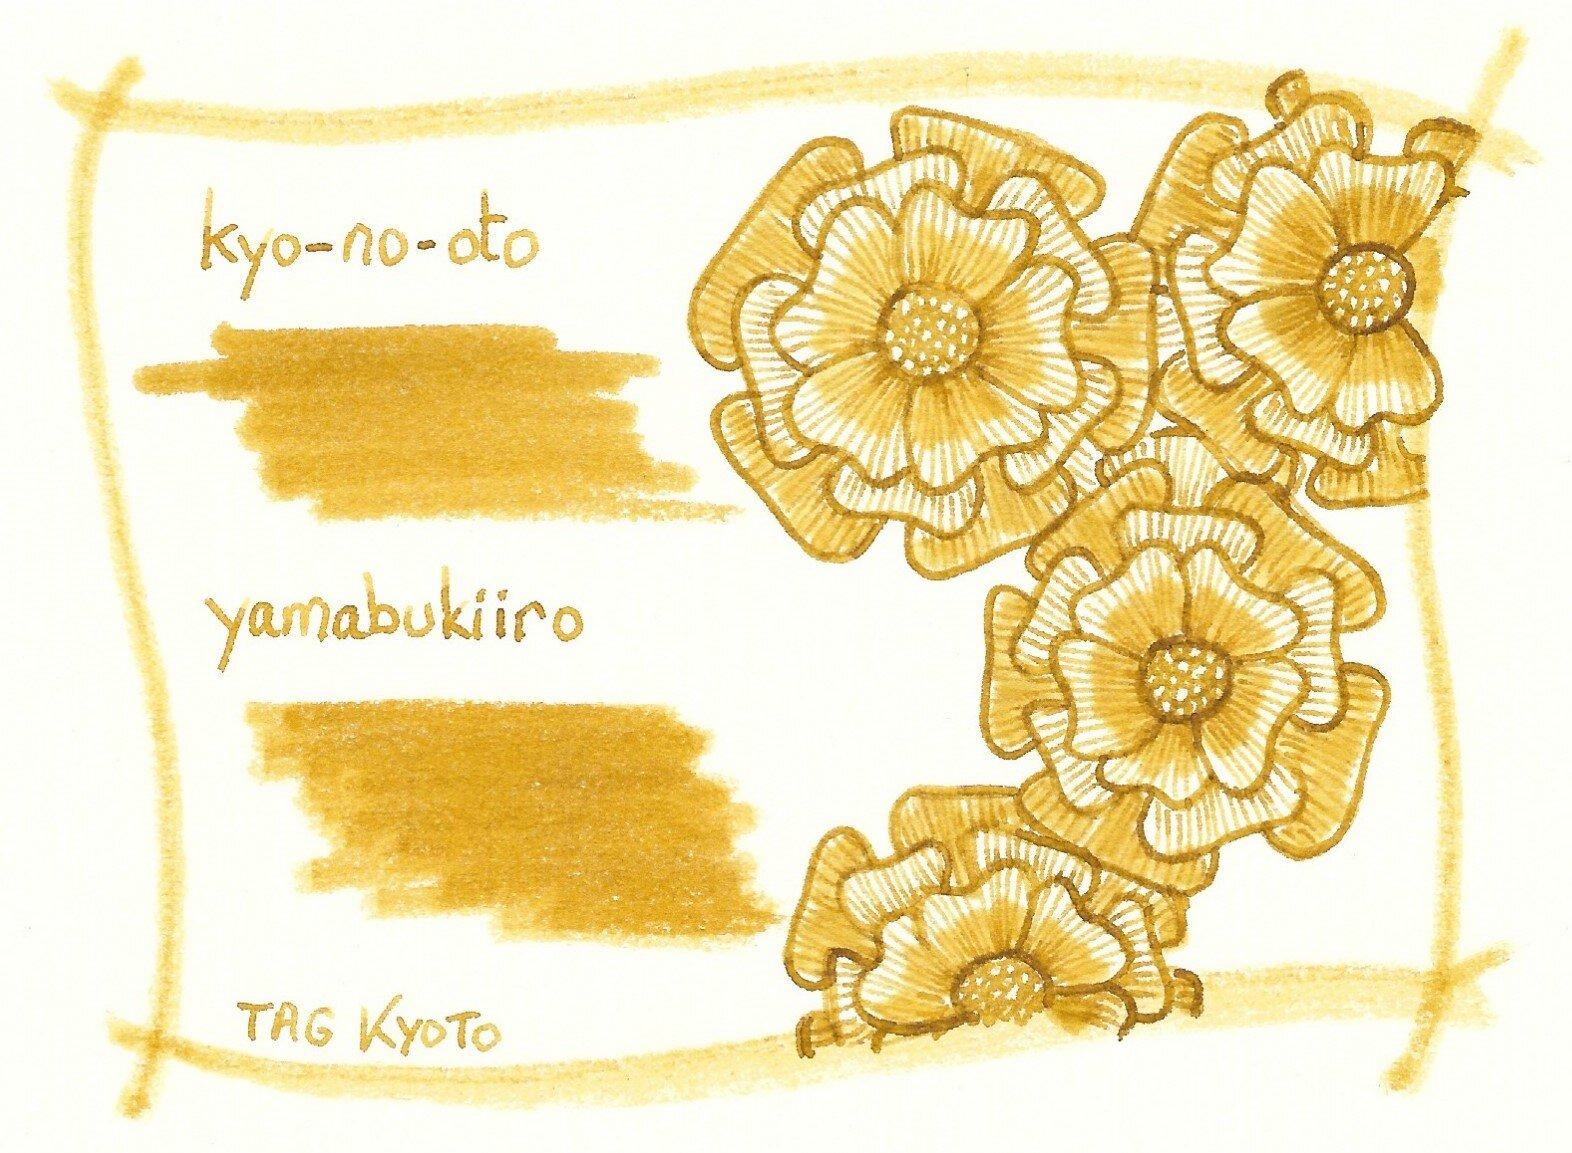 kyo-no-oto - yamabukiiro - title 300ppi.jpg